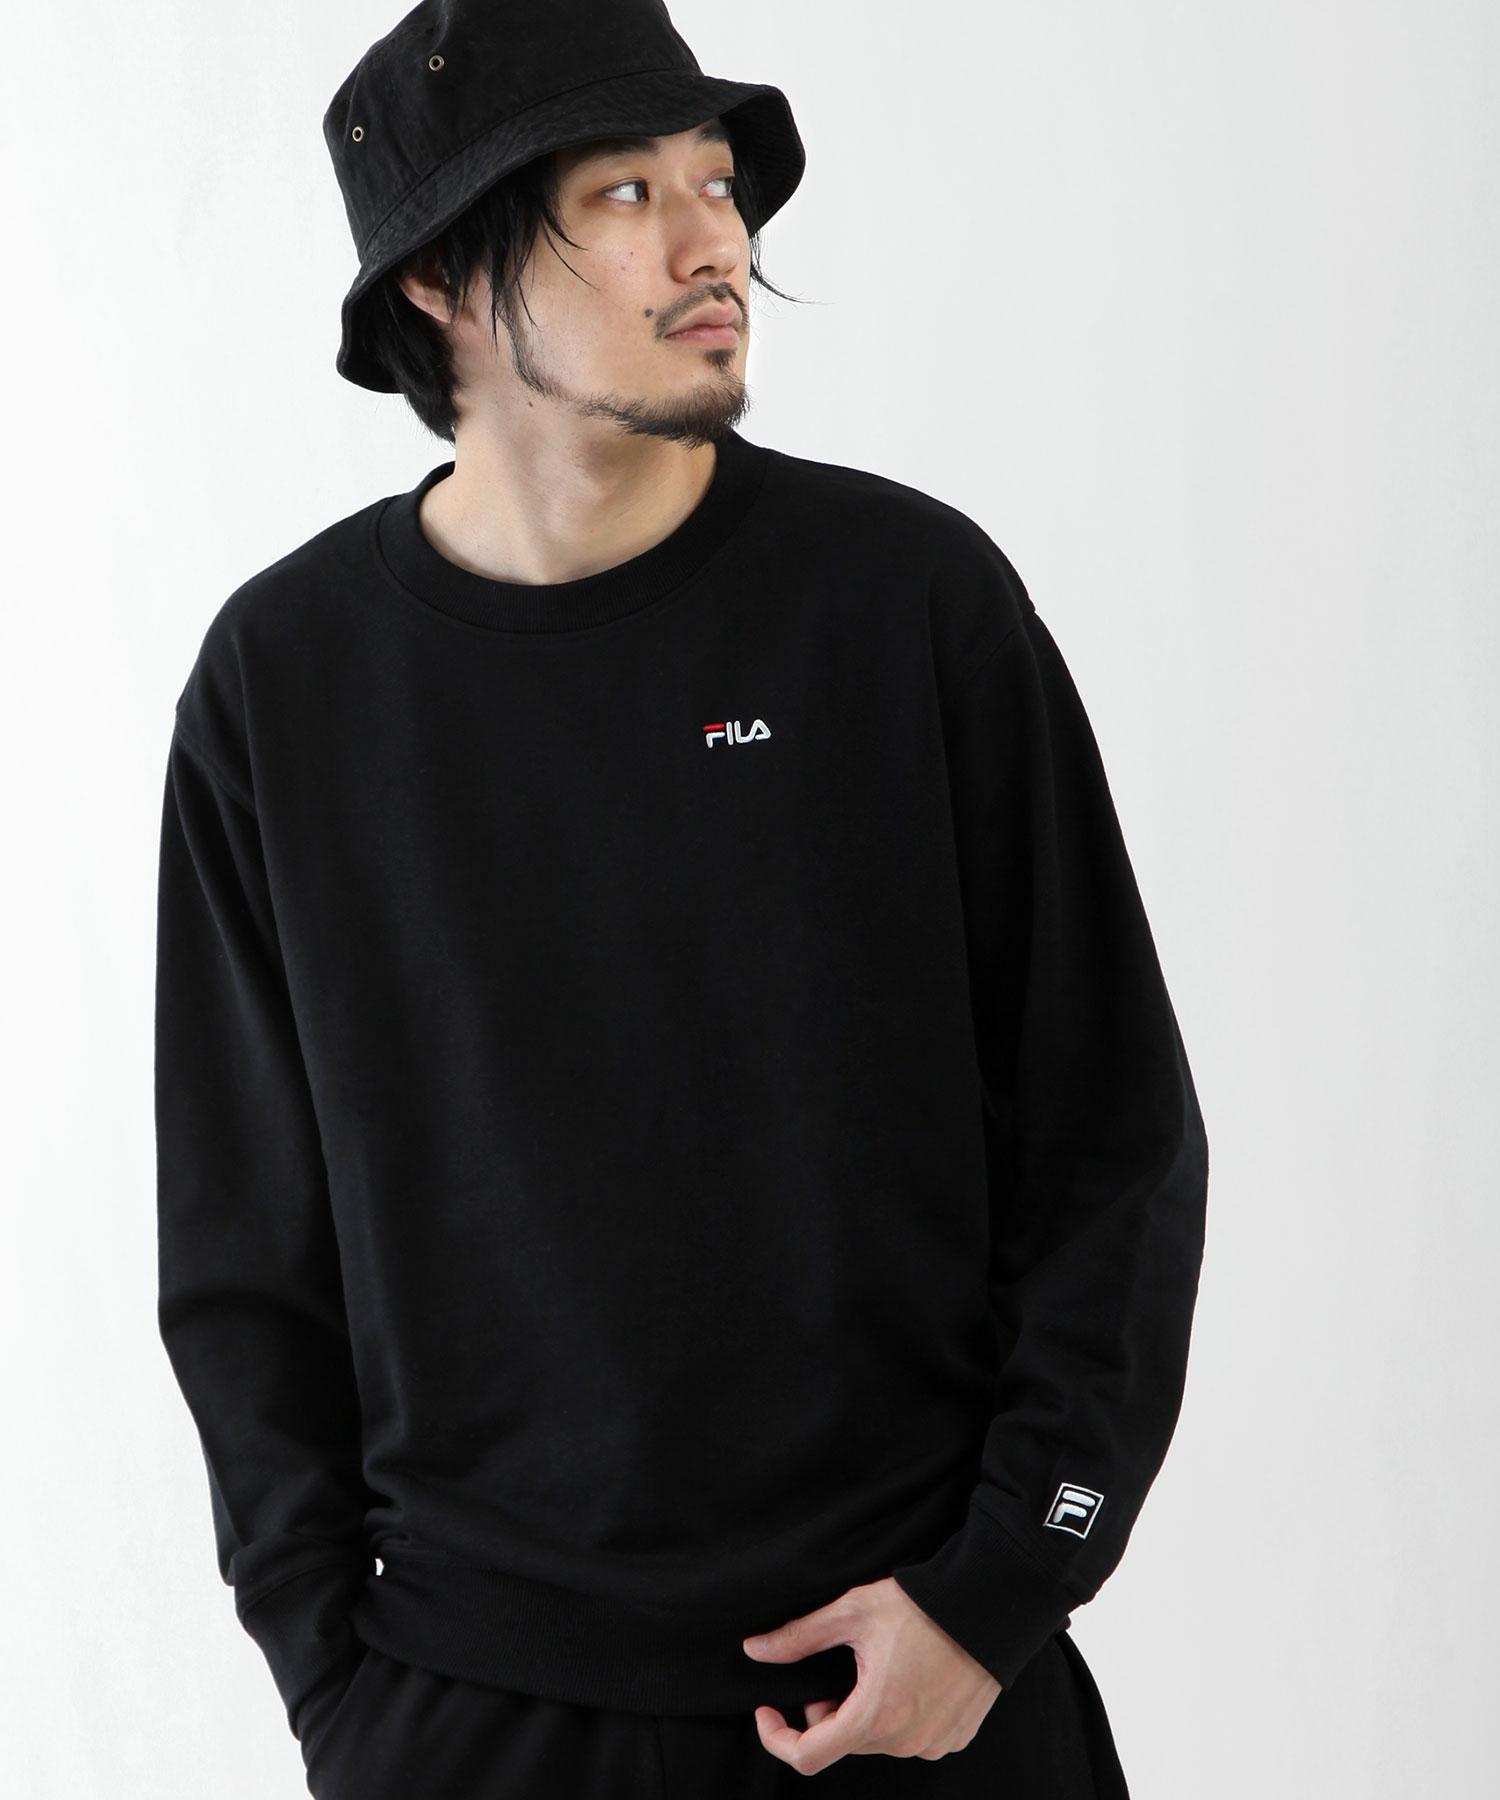 【FILA】LOGO刺繡運動衫 1